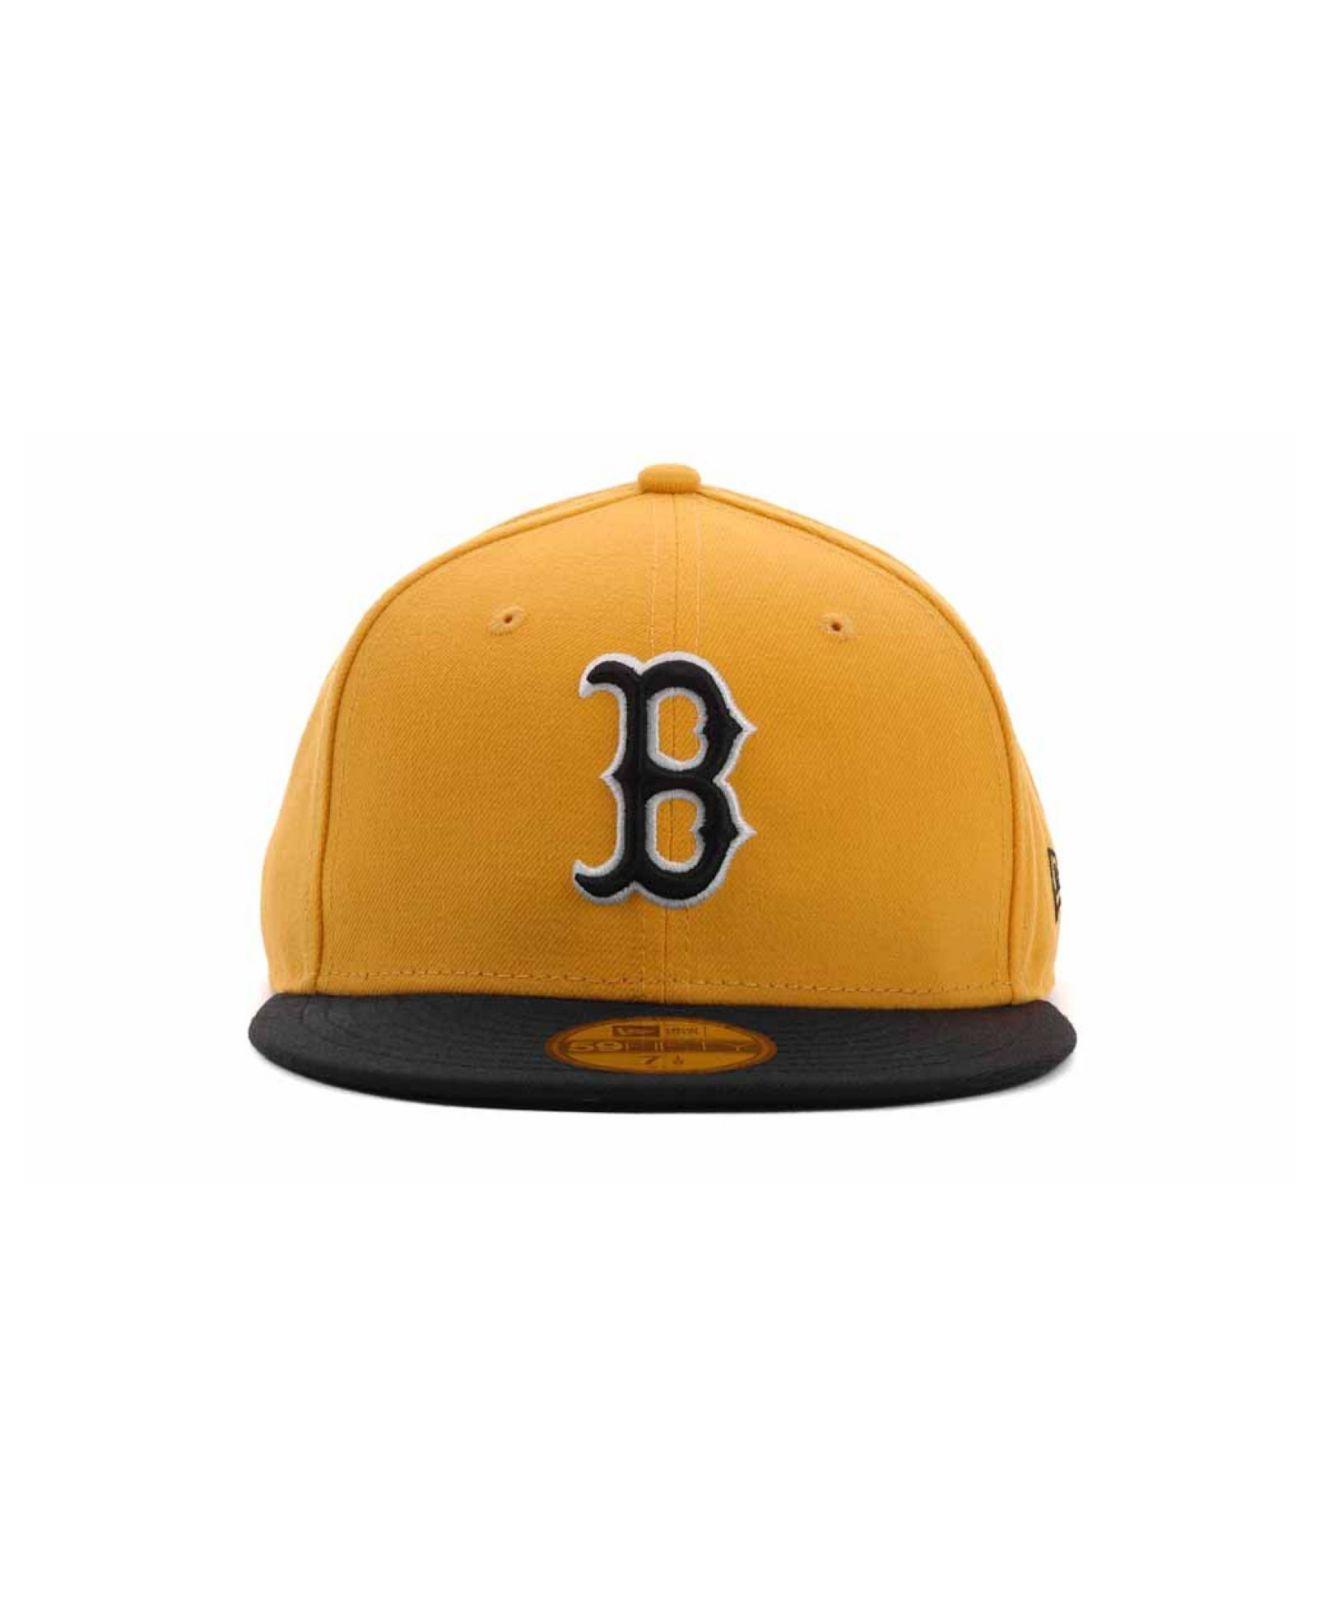 timeless design cf98e ed959 ... ireland lyst ktz boston red sox 2 tone 59fifty cap in yellow for men  df85f c03d9 ...